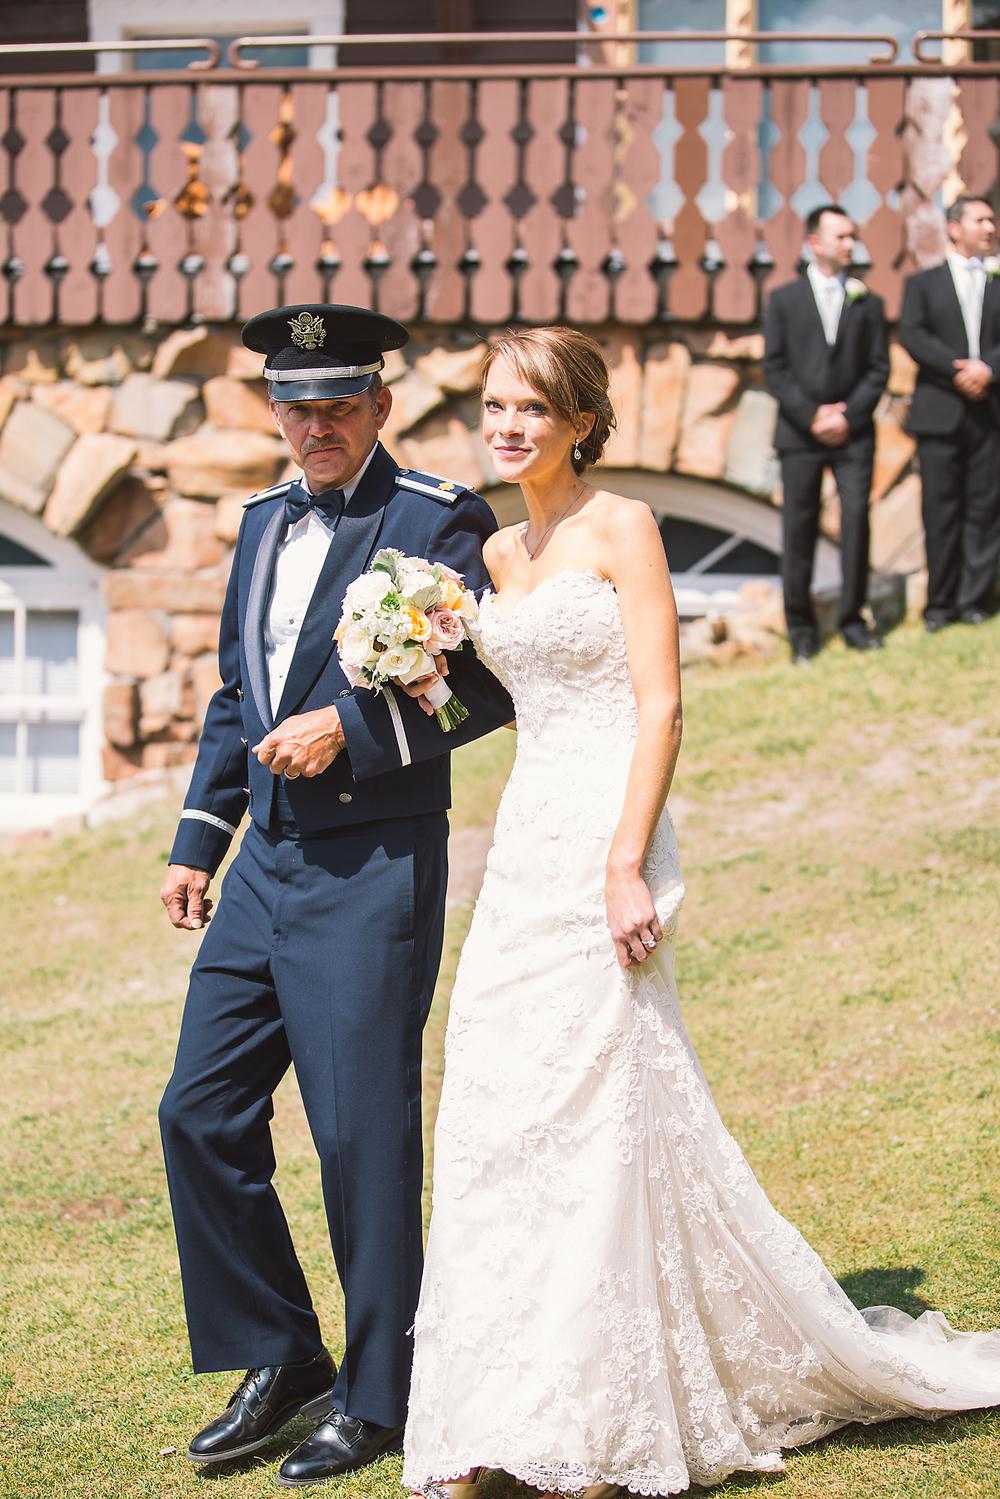 brett-birdsong-photography-082814-bride-dad.jpg